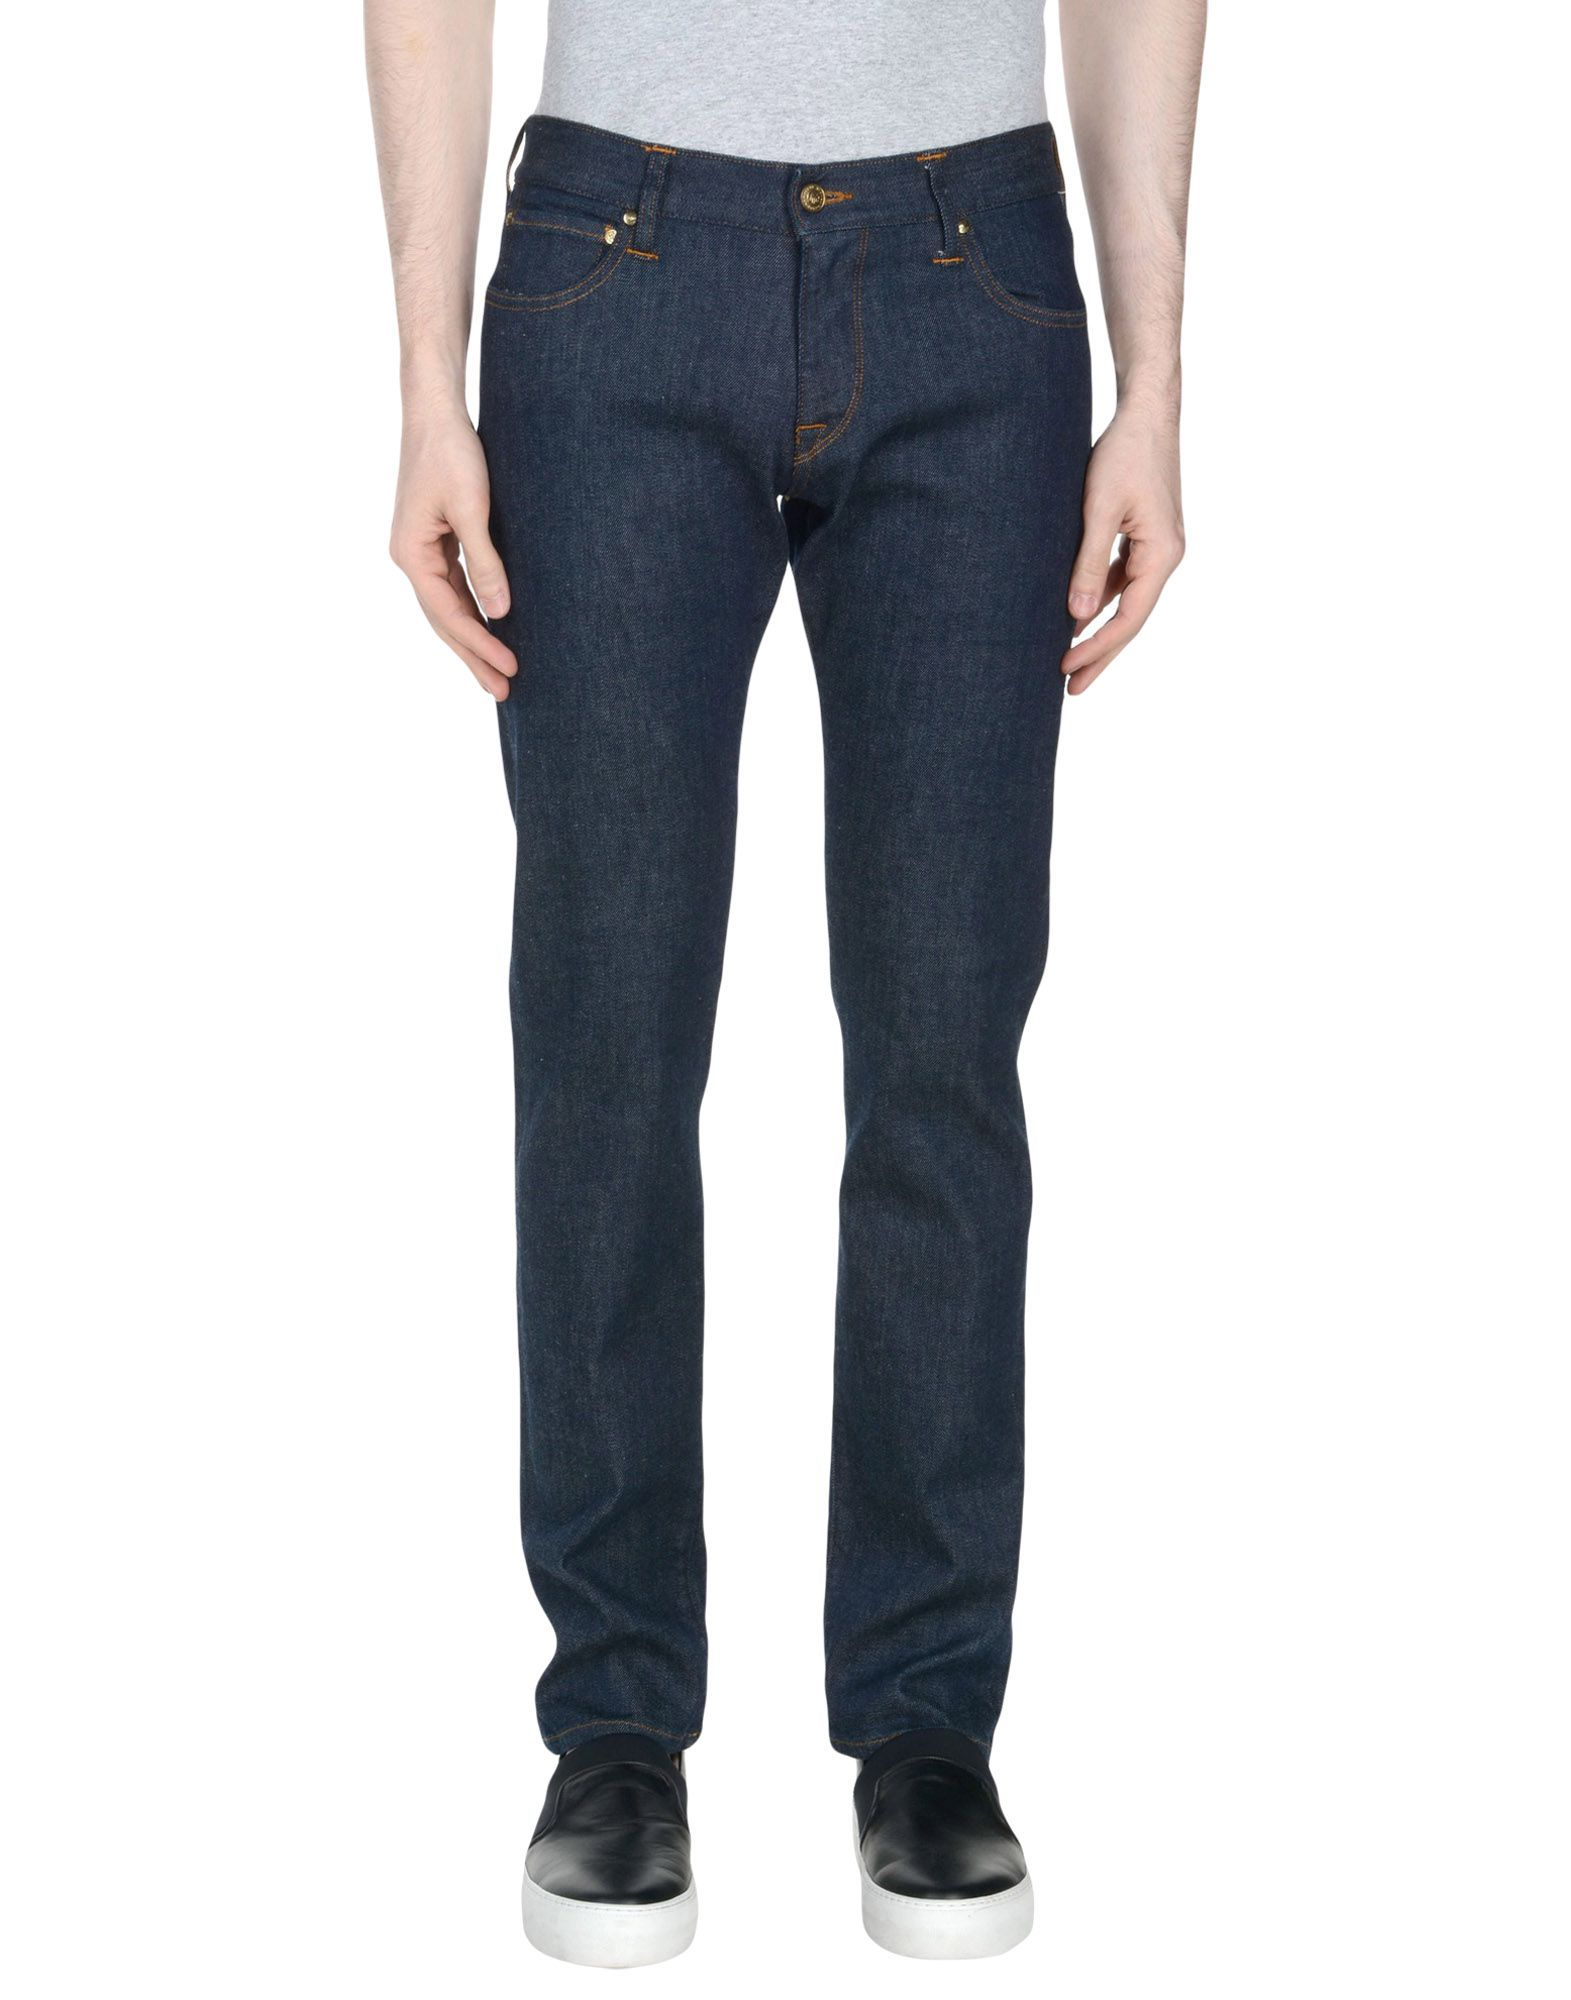 Pantaloni Jeans True Nyc. Uomo - Acquista online su